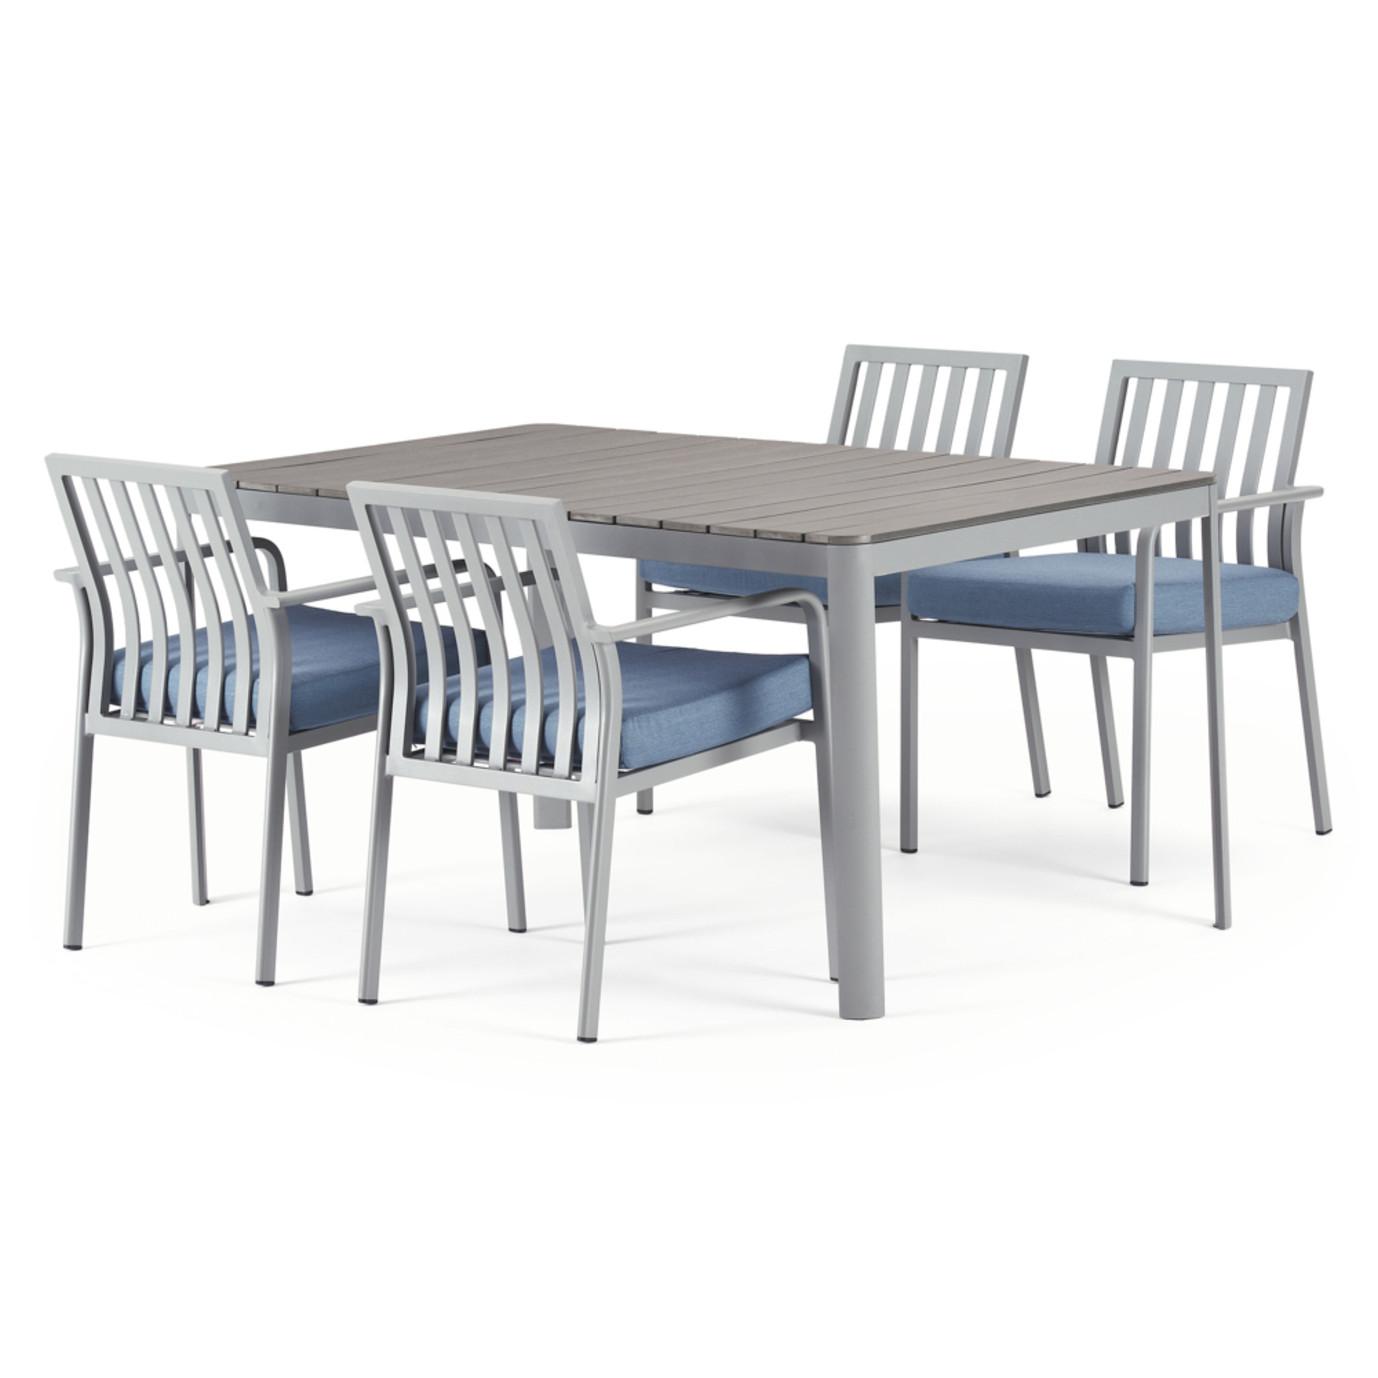 Vera 5 Piece Dining Set - Newport Blue